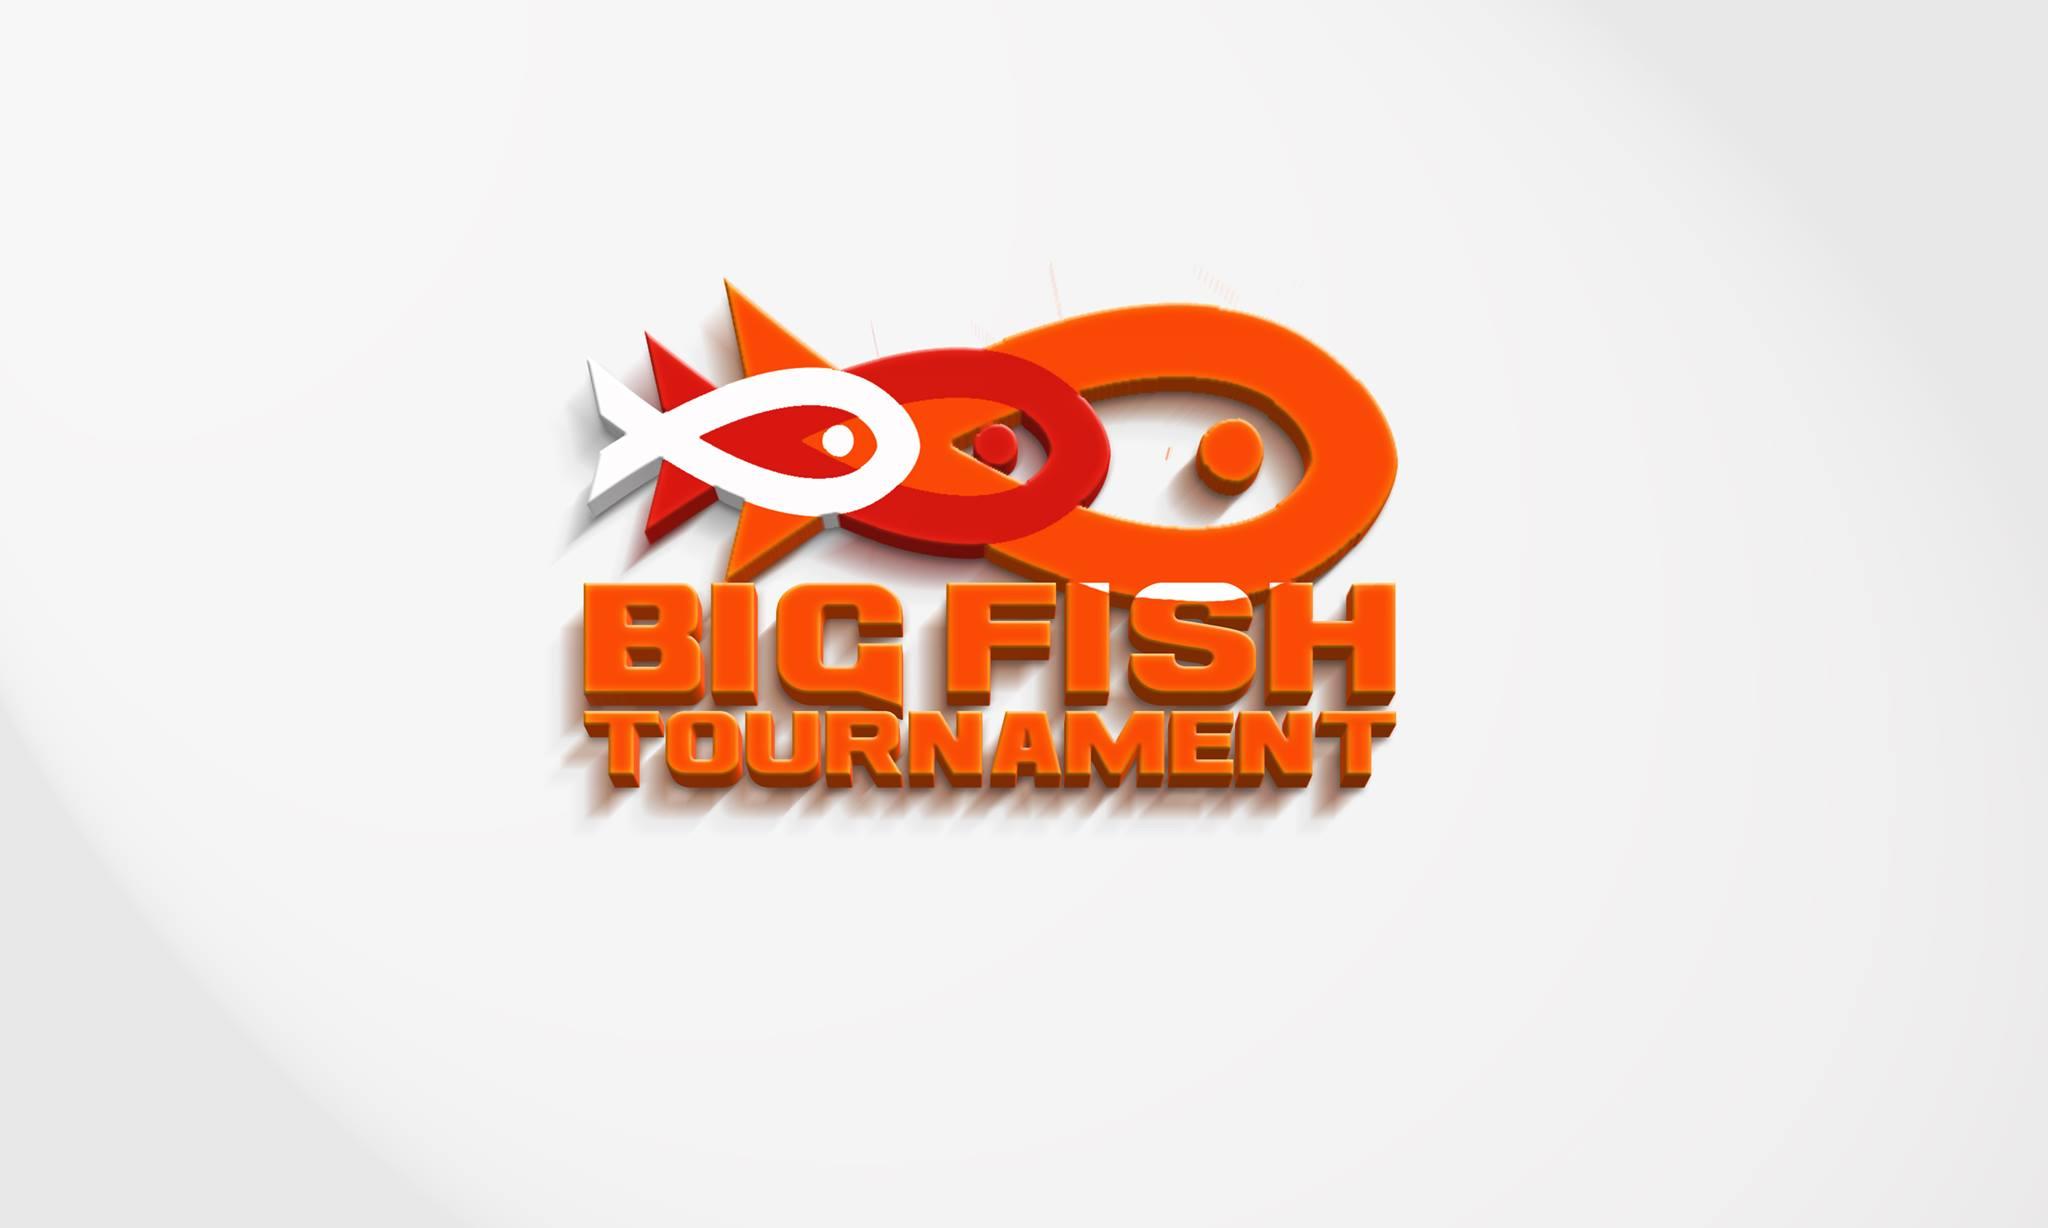 Big fish tournament 2015 starorzeka for Big fish classic